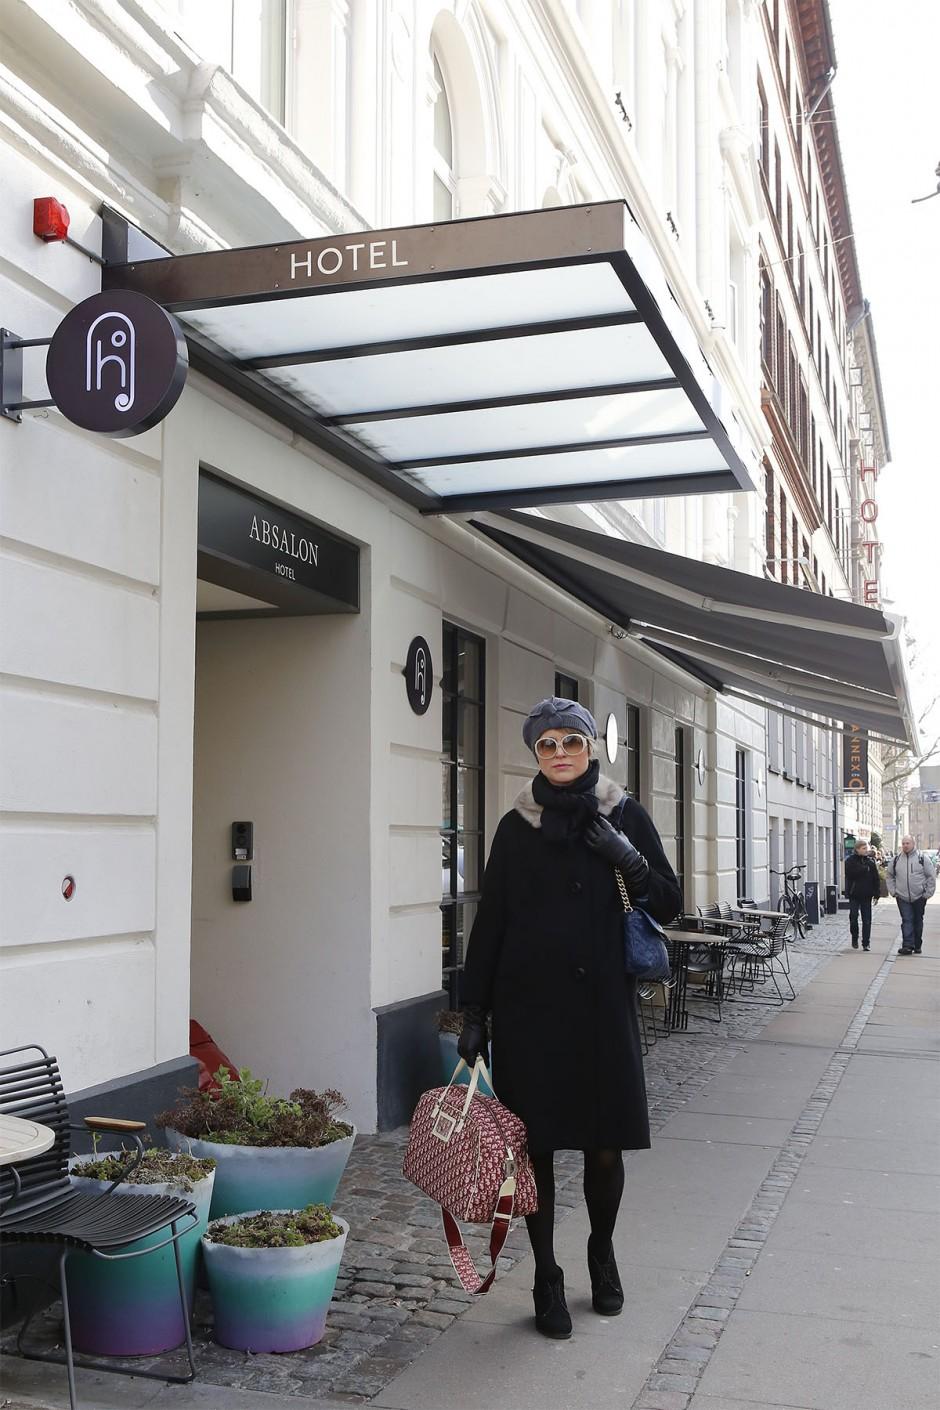 Absalon hotel köpenhamn